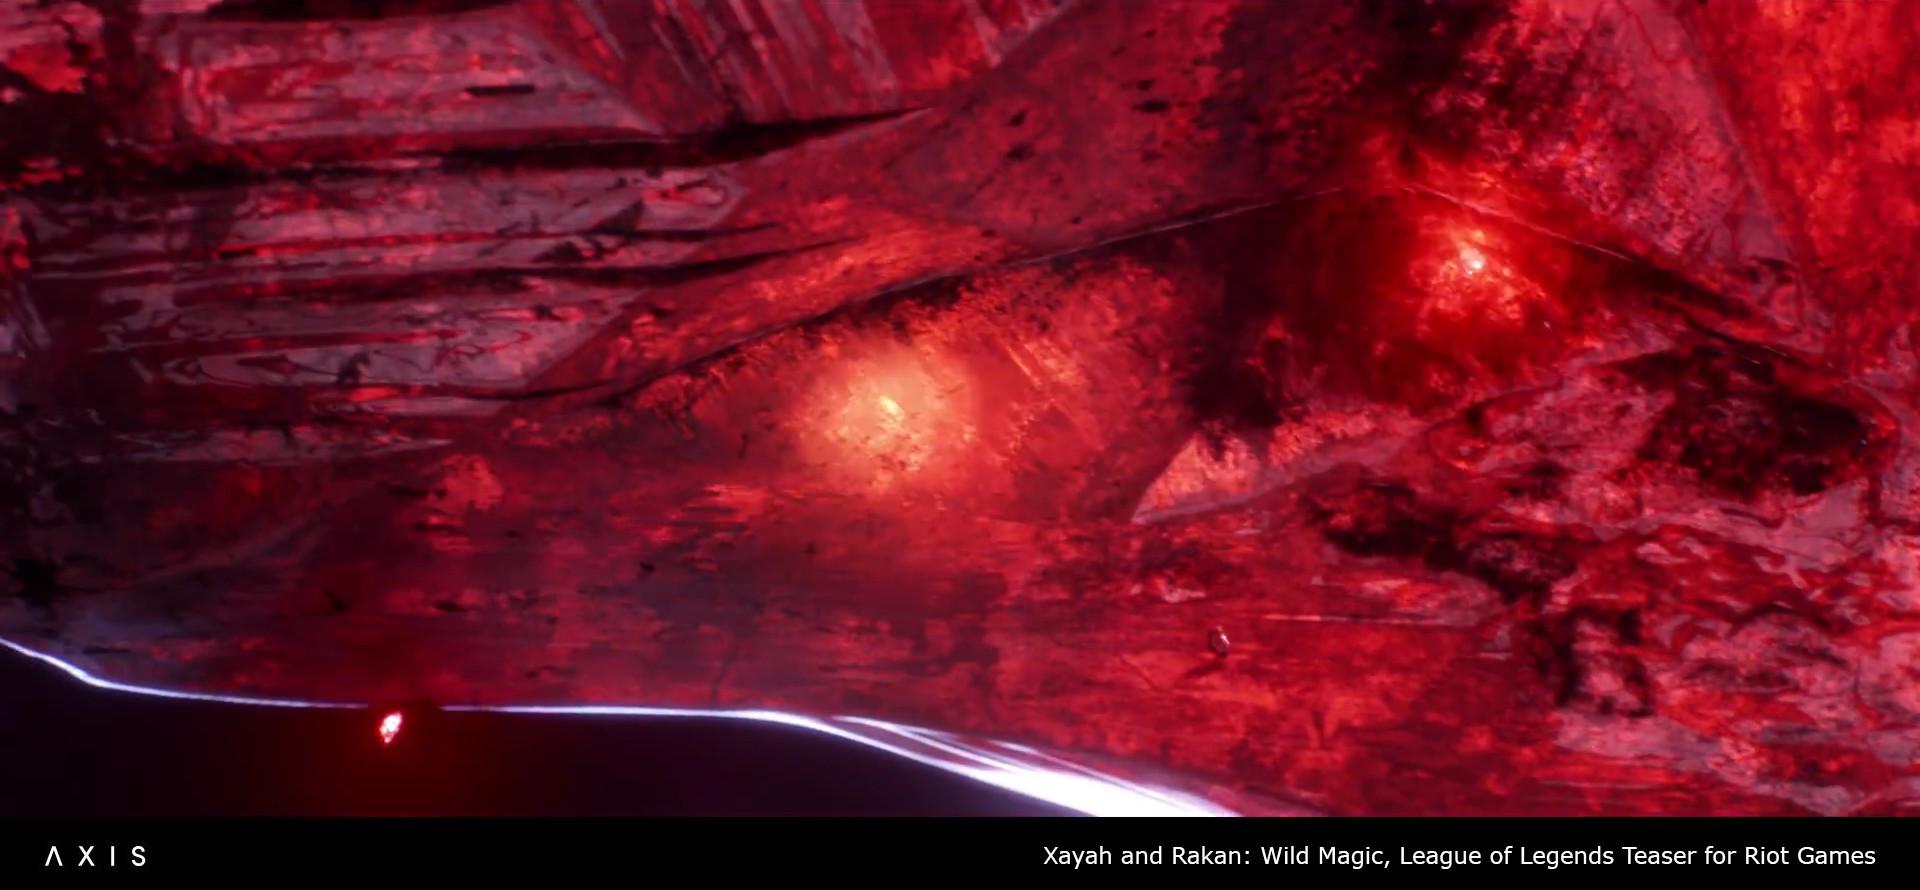 Crystal textures